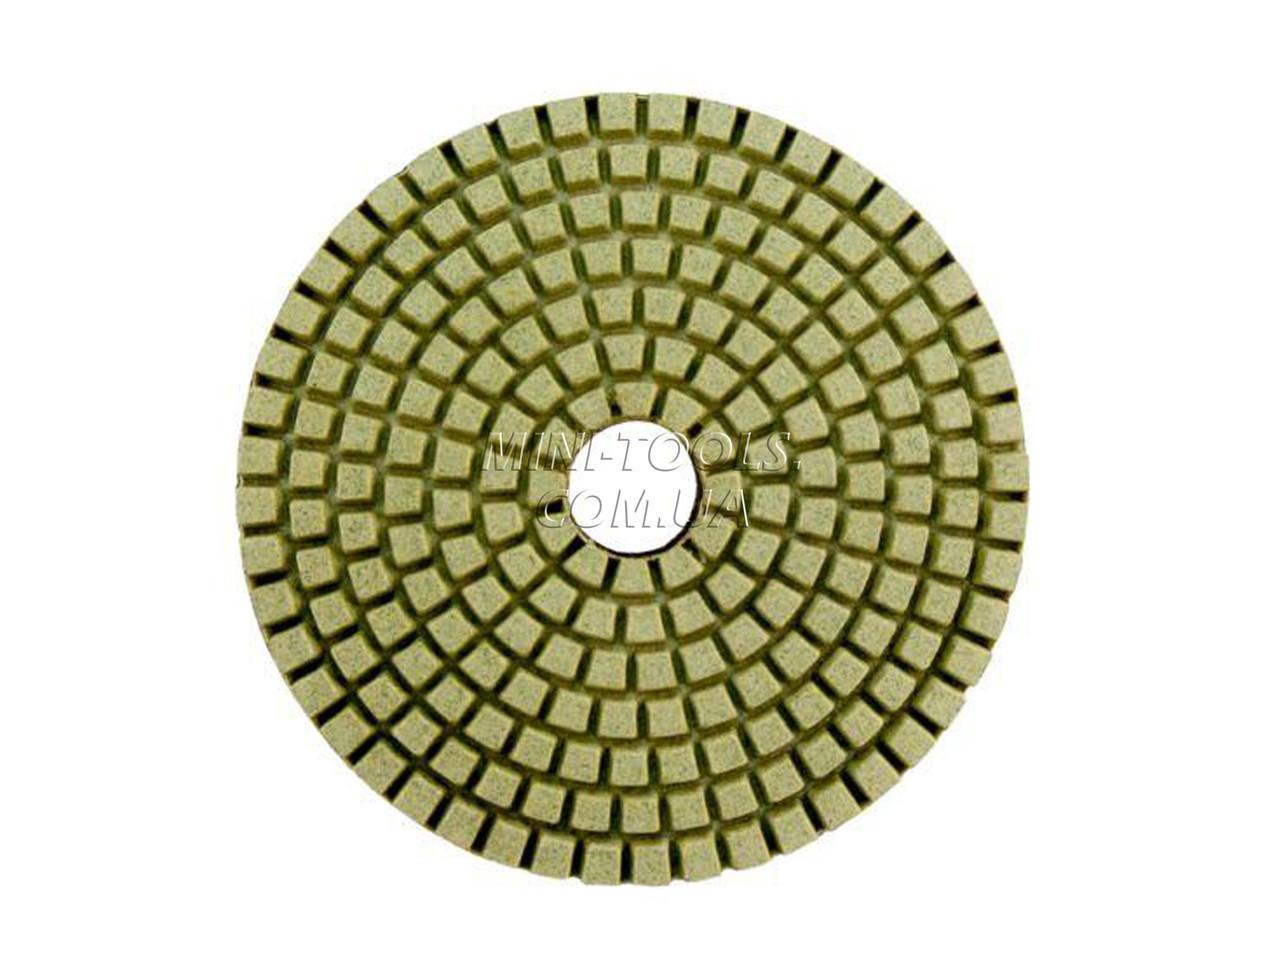 Черепашка D-100мм. зерно #300. Алмазний гнучкий шліфувальний круг YDS Tools